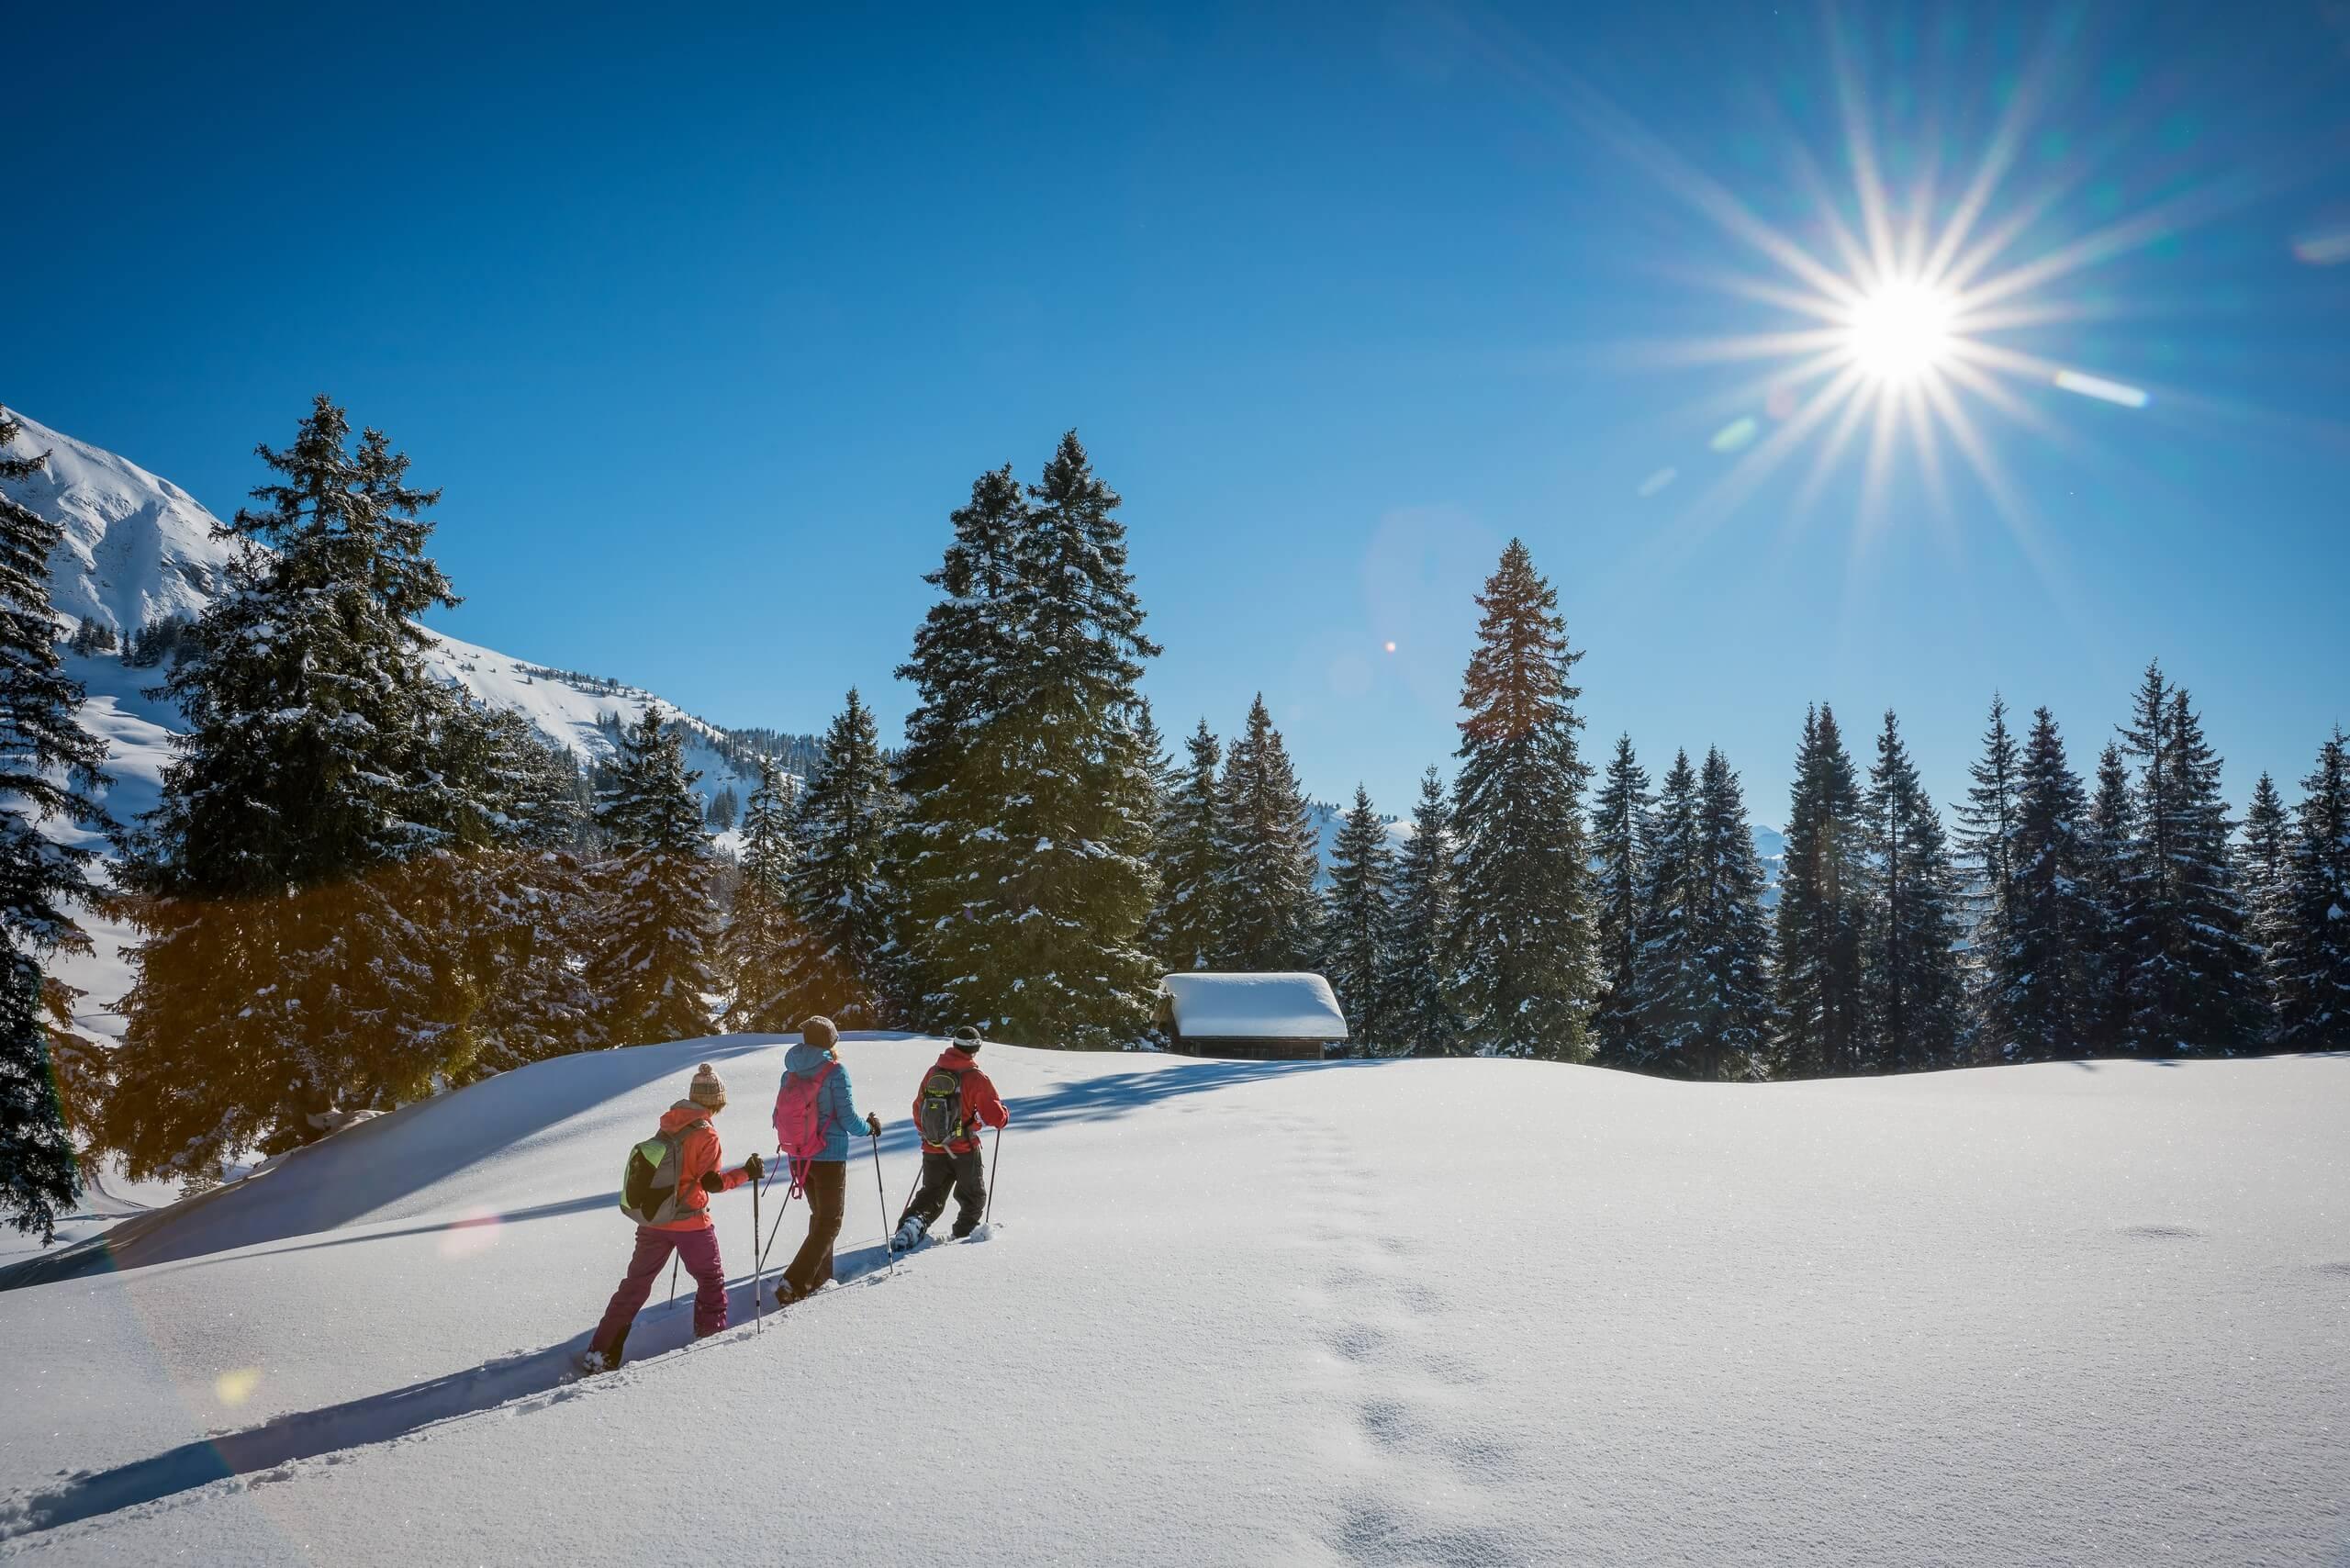 habkern-lombachalp-winter-schneeschuhlaufen-wald-huettli-soft-adventure